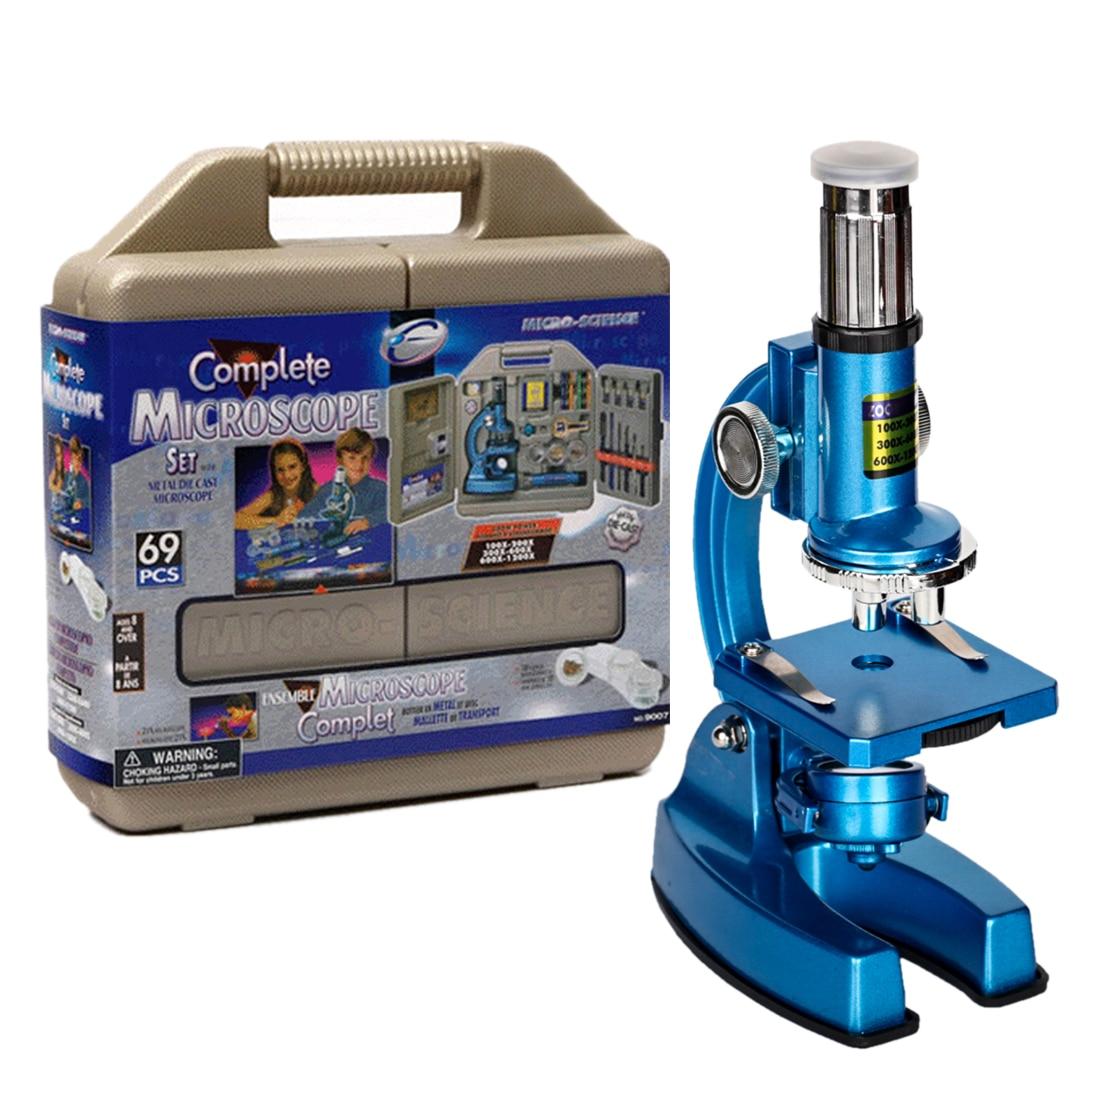 DIY 100X 200X 300X 600X 1200X Hd gran angular microscopio óptico puzle análisis celular equipo Experimental Stem Toy para niños - 3